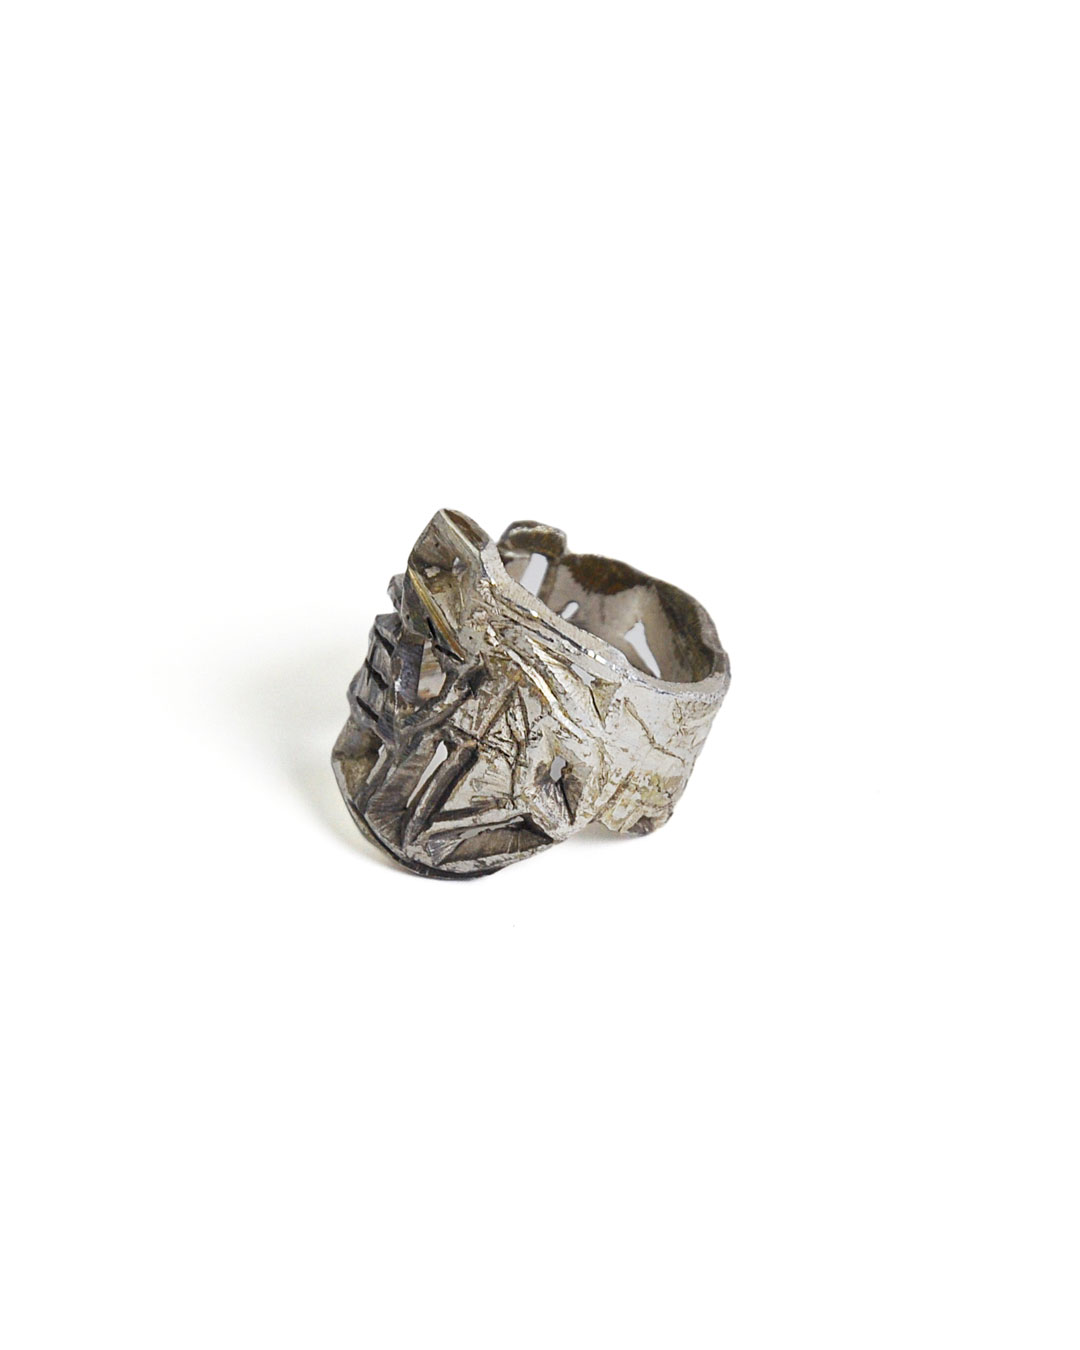 Rudolf Kocéa, untitled, 2014, ring; silver alloy, ø 22 x 23 mm, €680